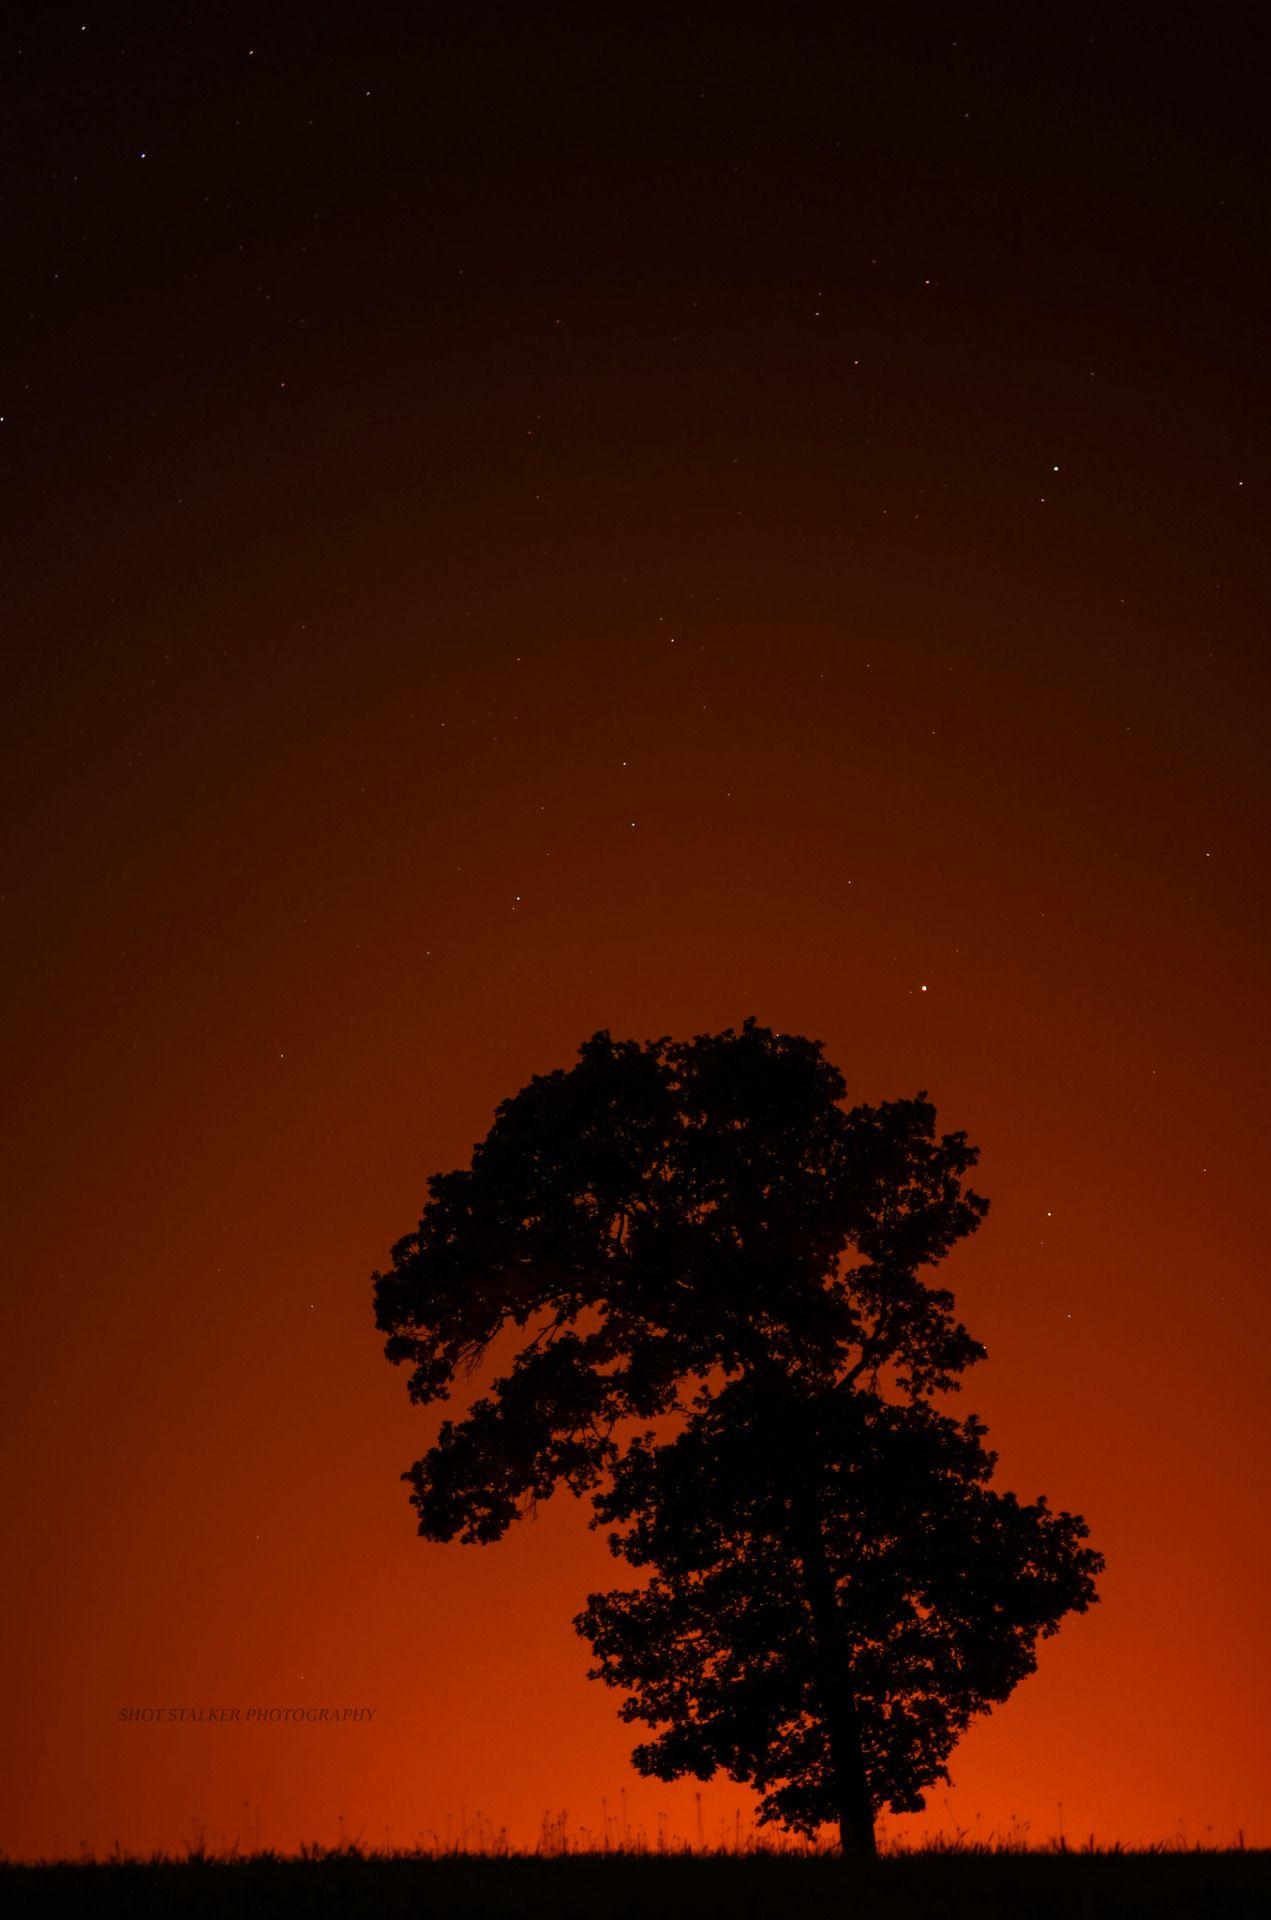 Nuclear Nature (via Shot Stalker Photography)